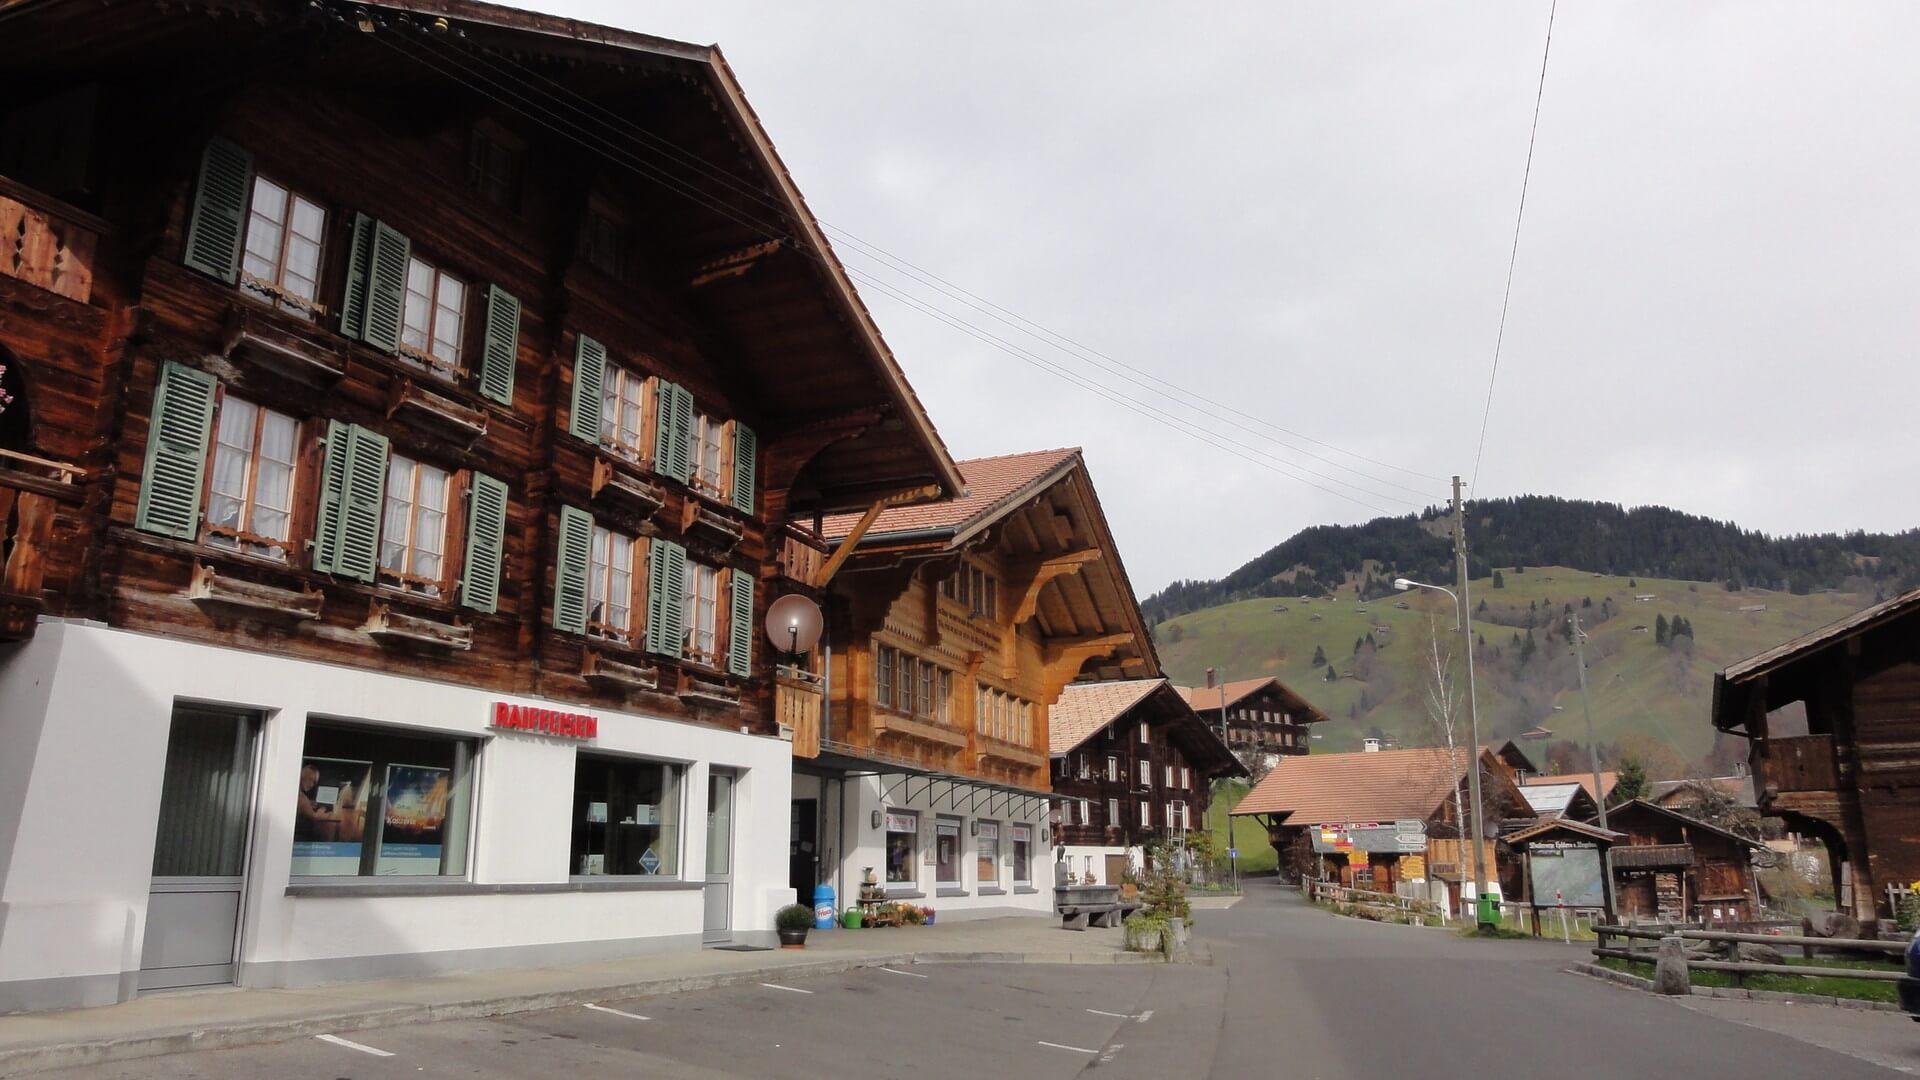 habkern-tourismusbuero-haeuser